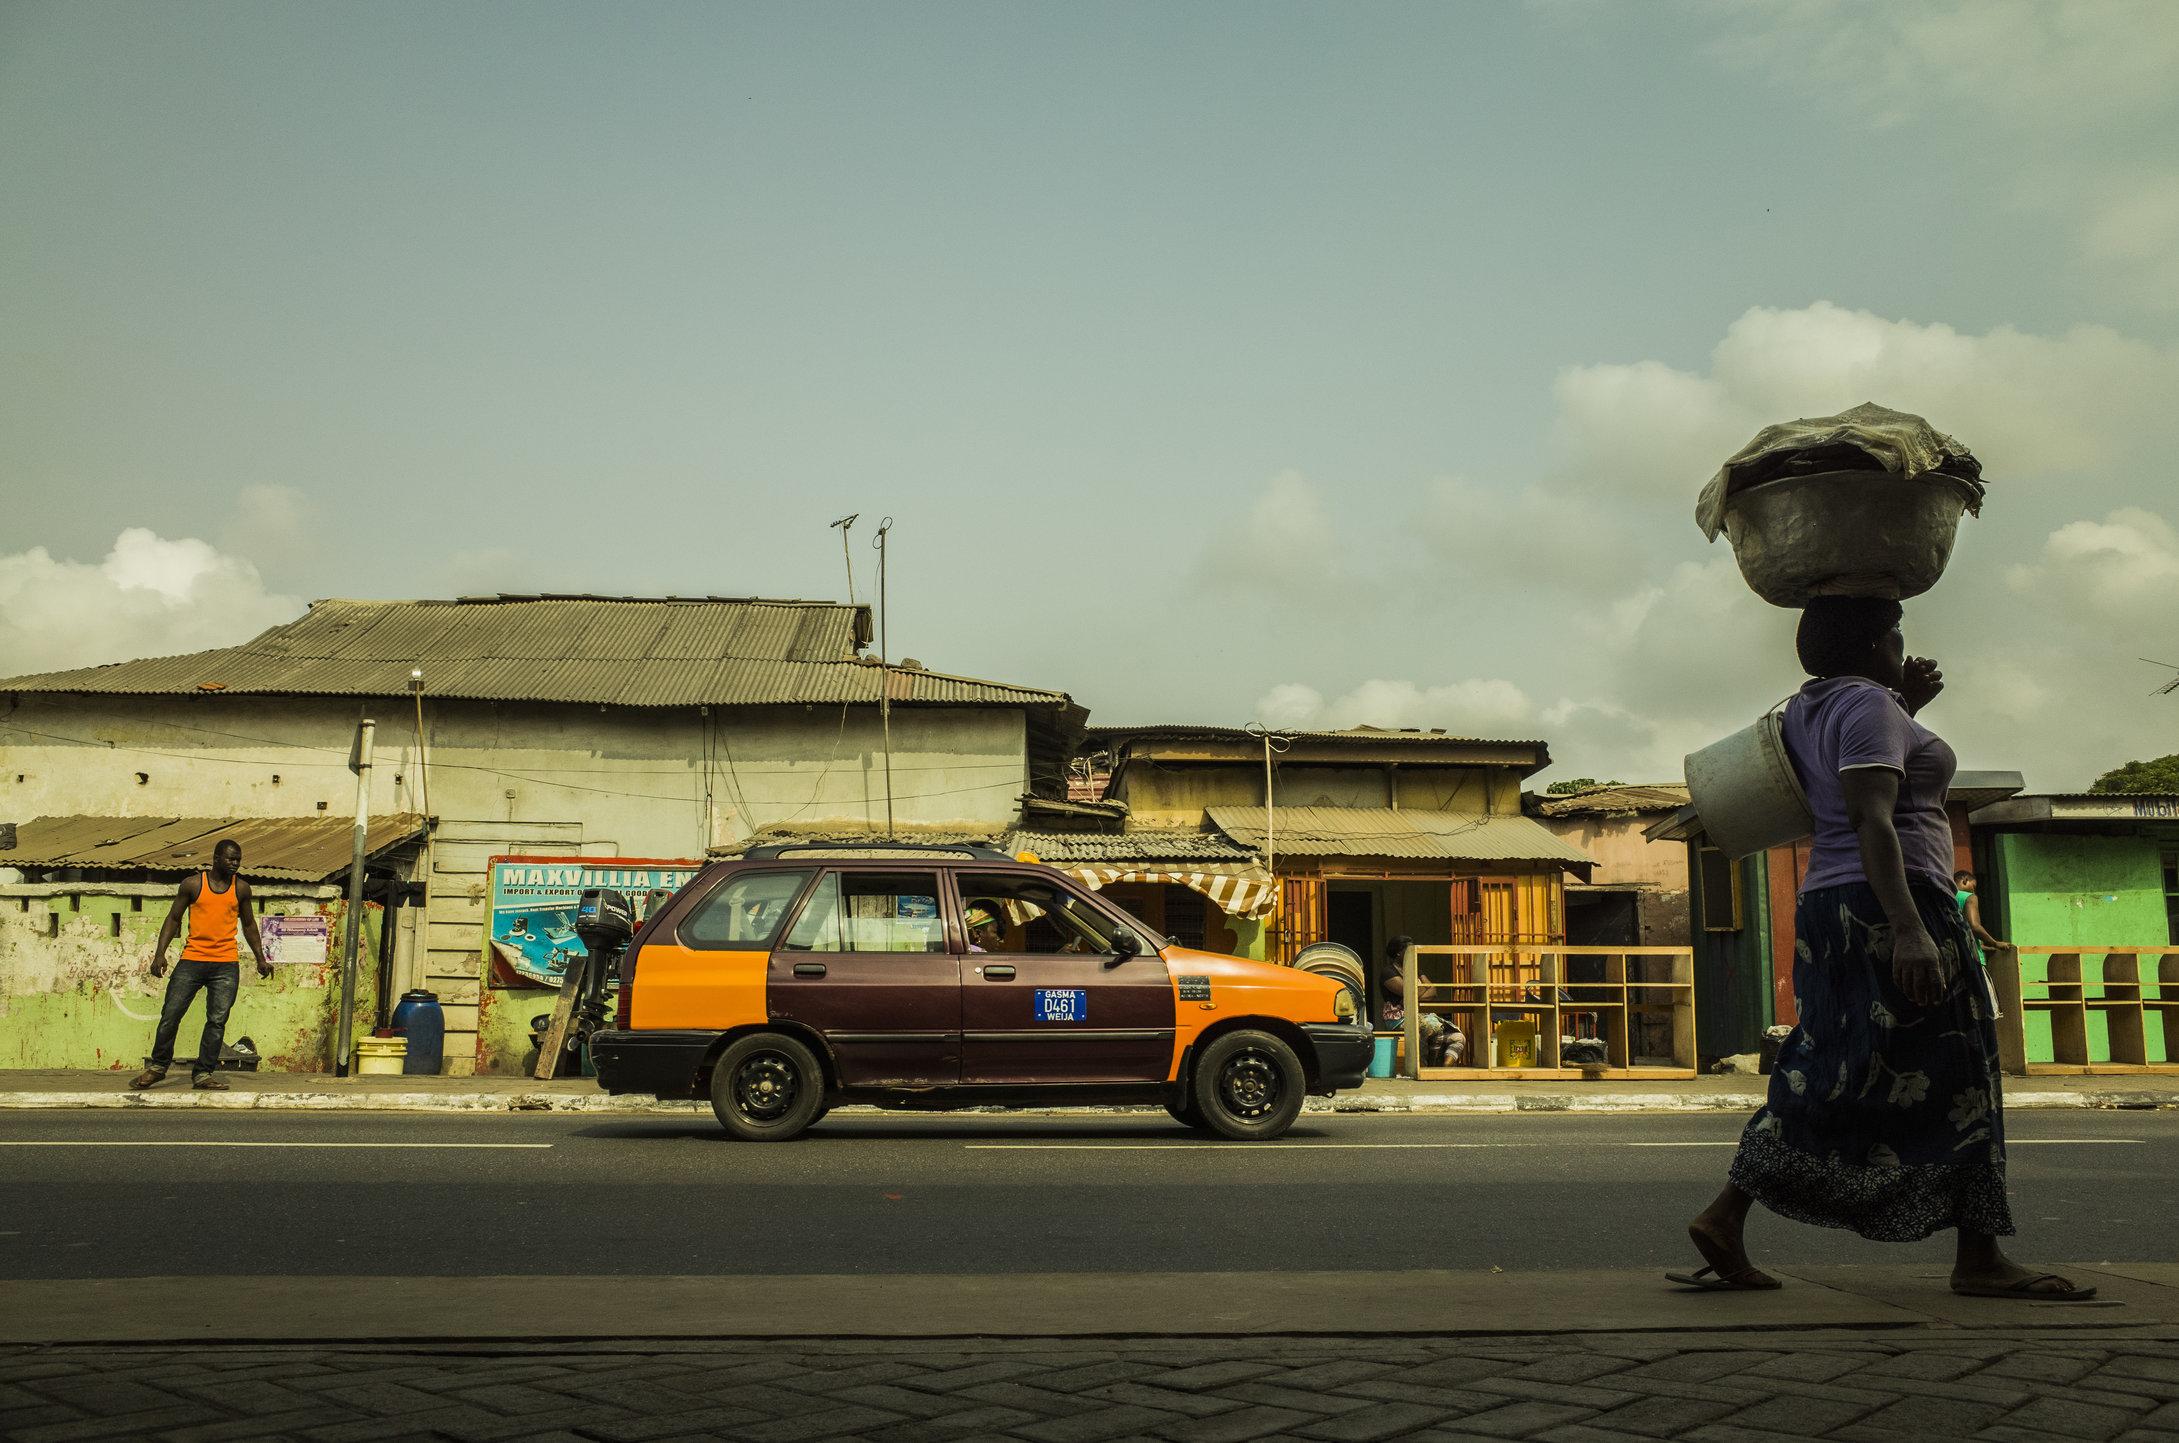 Accra, Ghana. 2014.